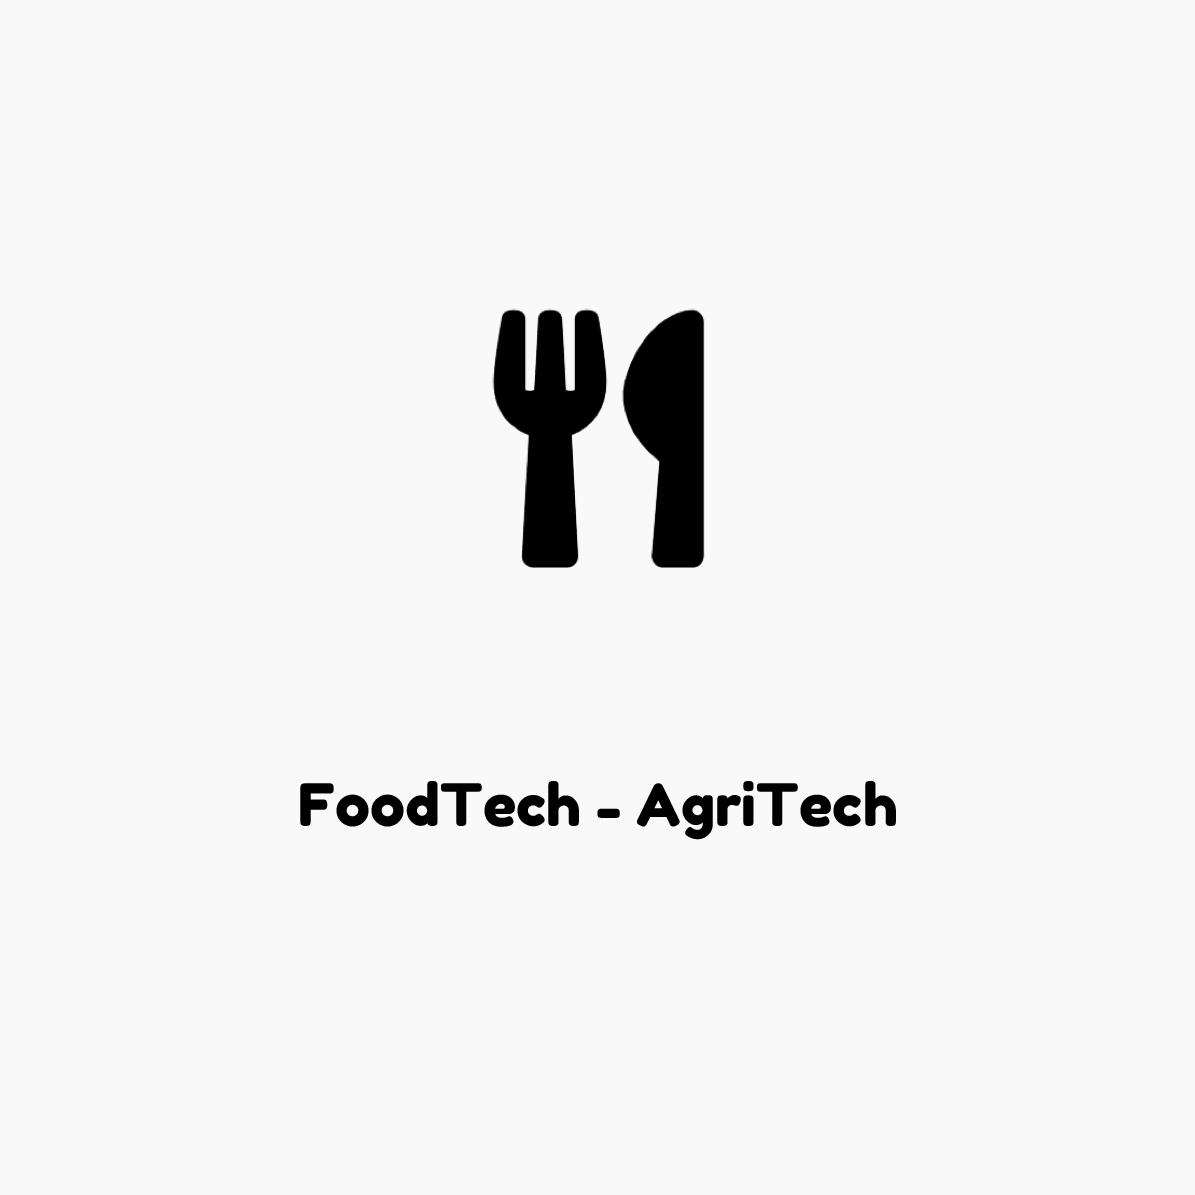 FoodTech AgriTech